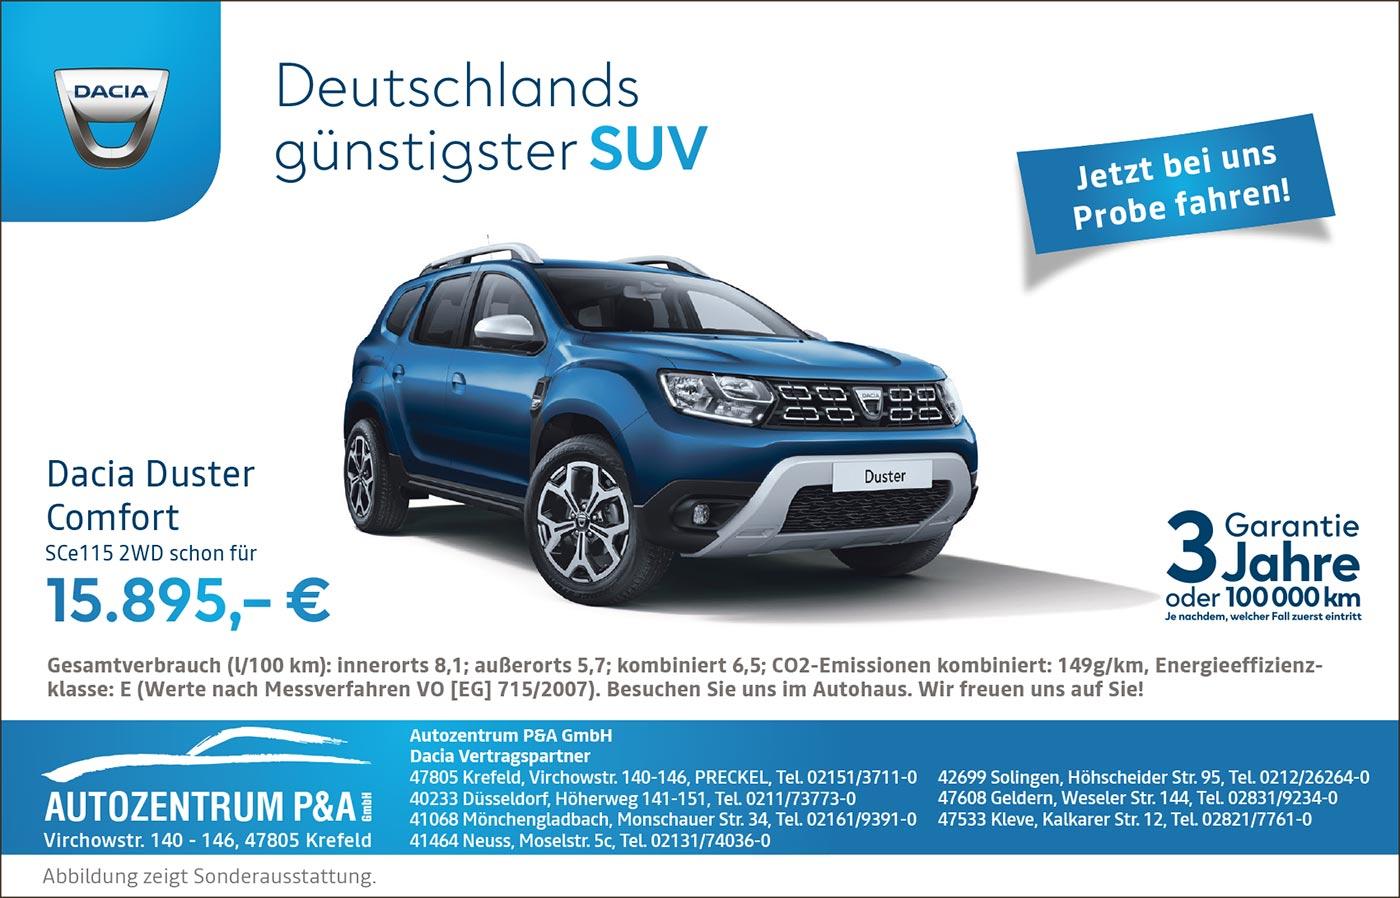 Dacia Duster 2019 Angebot vom Autozentrum P&A-Preckel